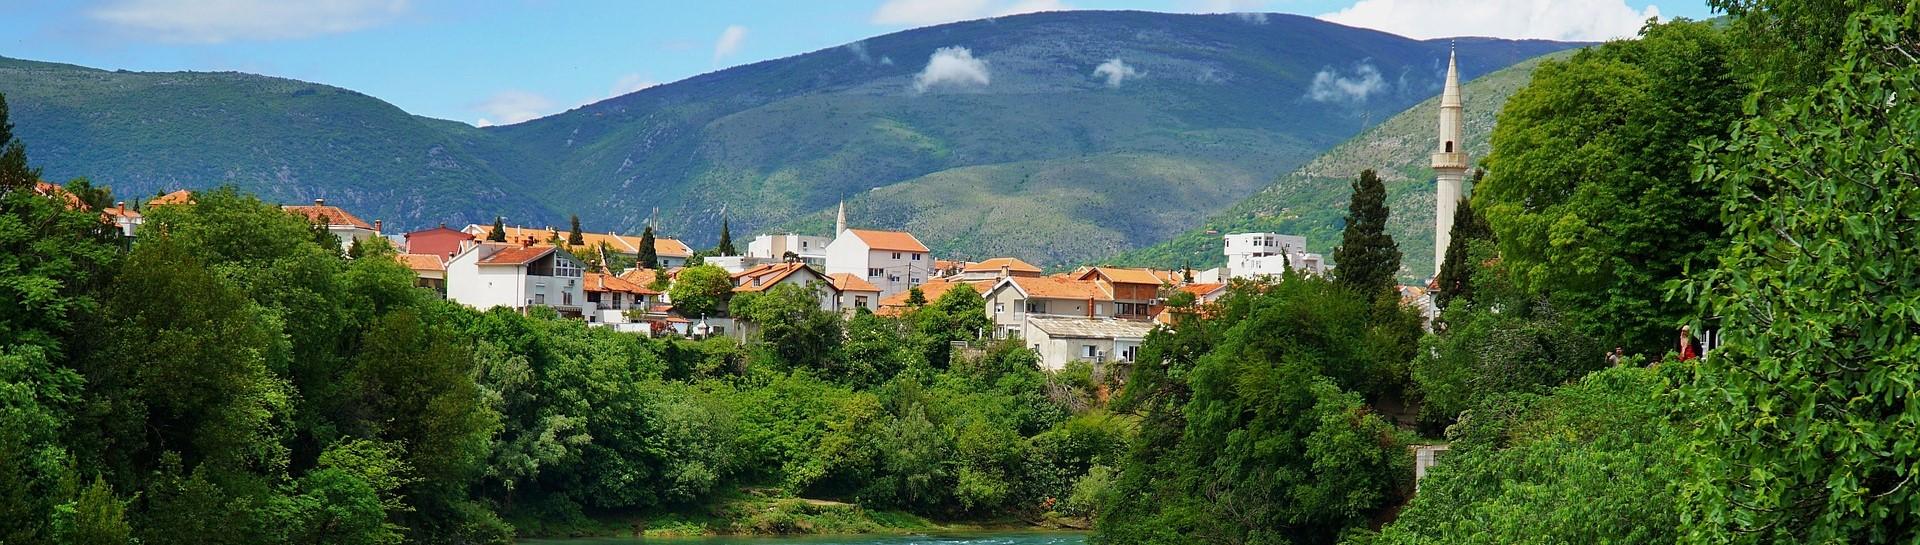 Multi-Active Program in Sarajevo and Mostar: Hiking, Biking, and Rafting